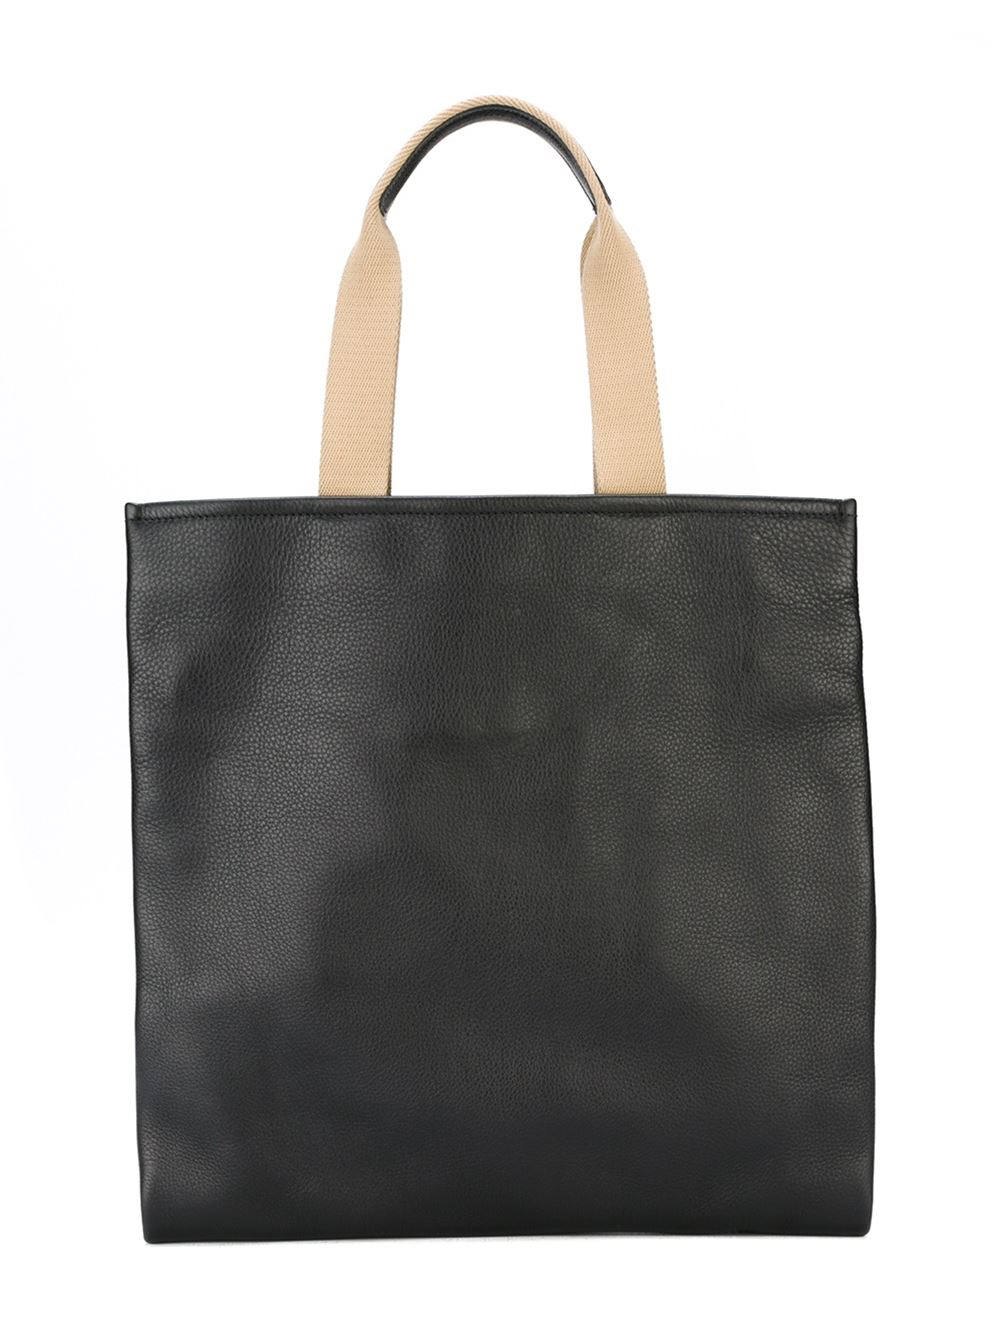 Dolce   Gabbana Family Patch Shopping Bag in Black - Lyst 3480d8cd4cb65